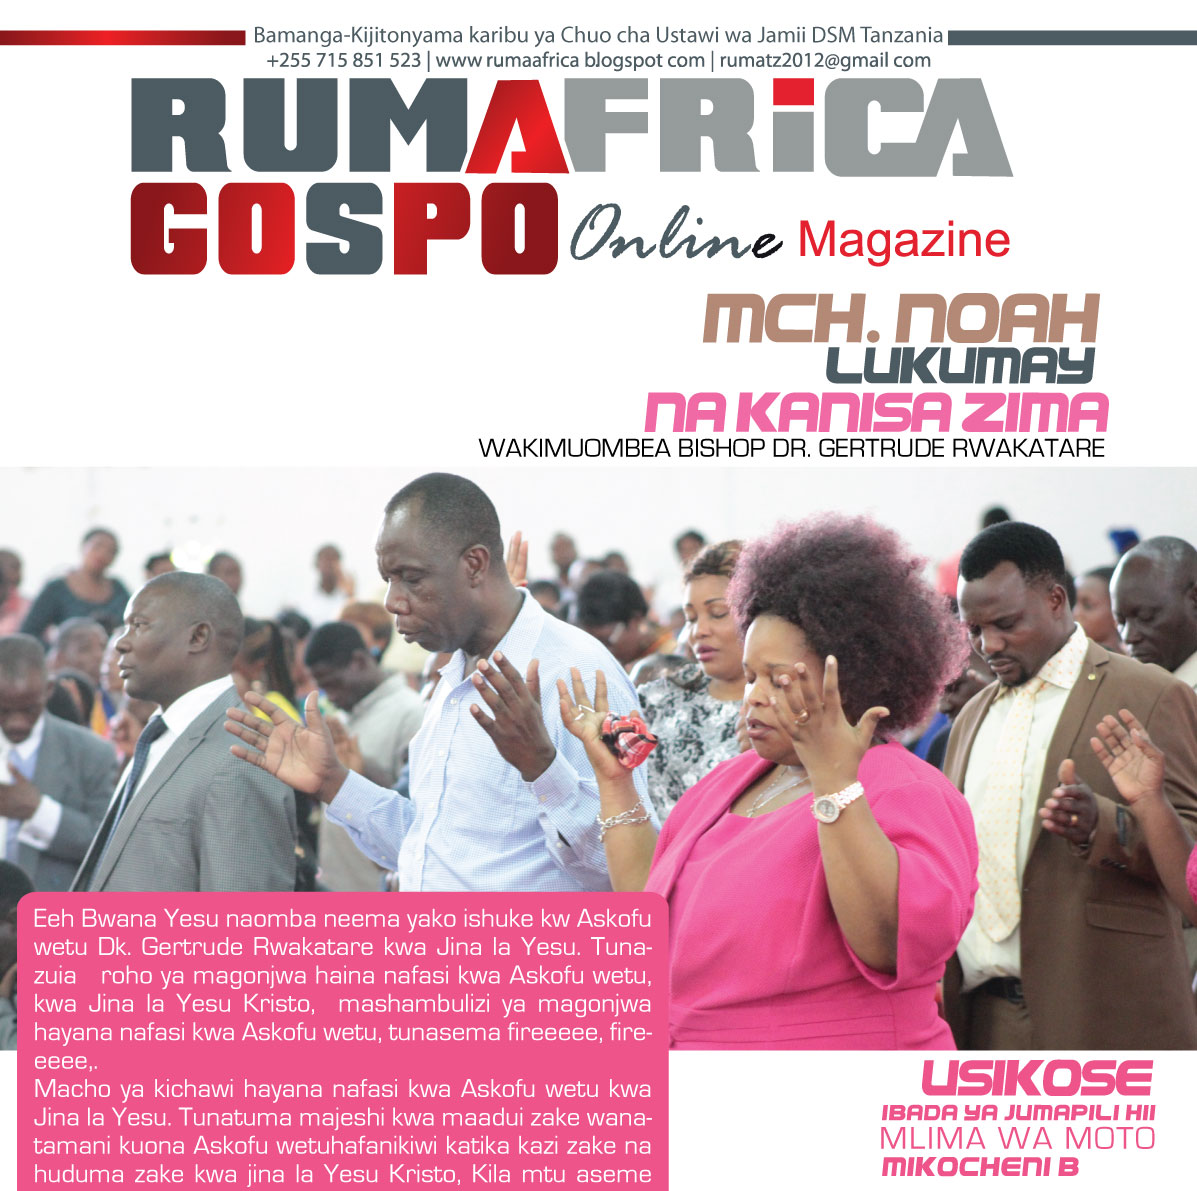 Rumafrica online magazine inakuletea machache kutoka Internet magasin